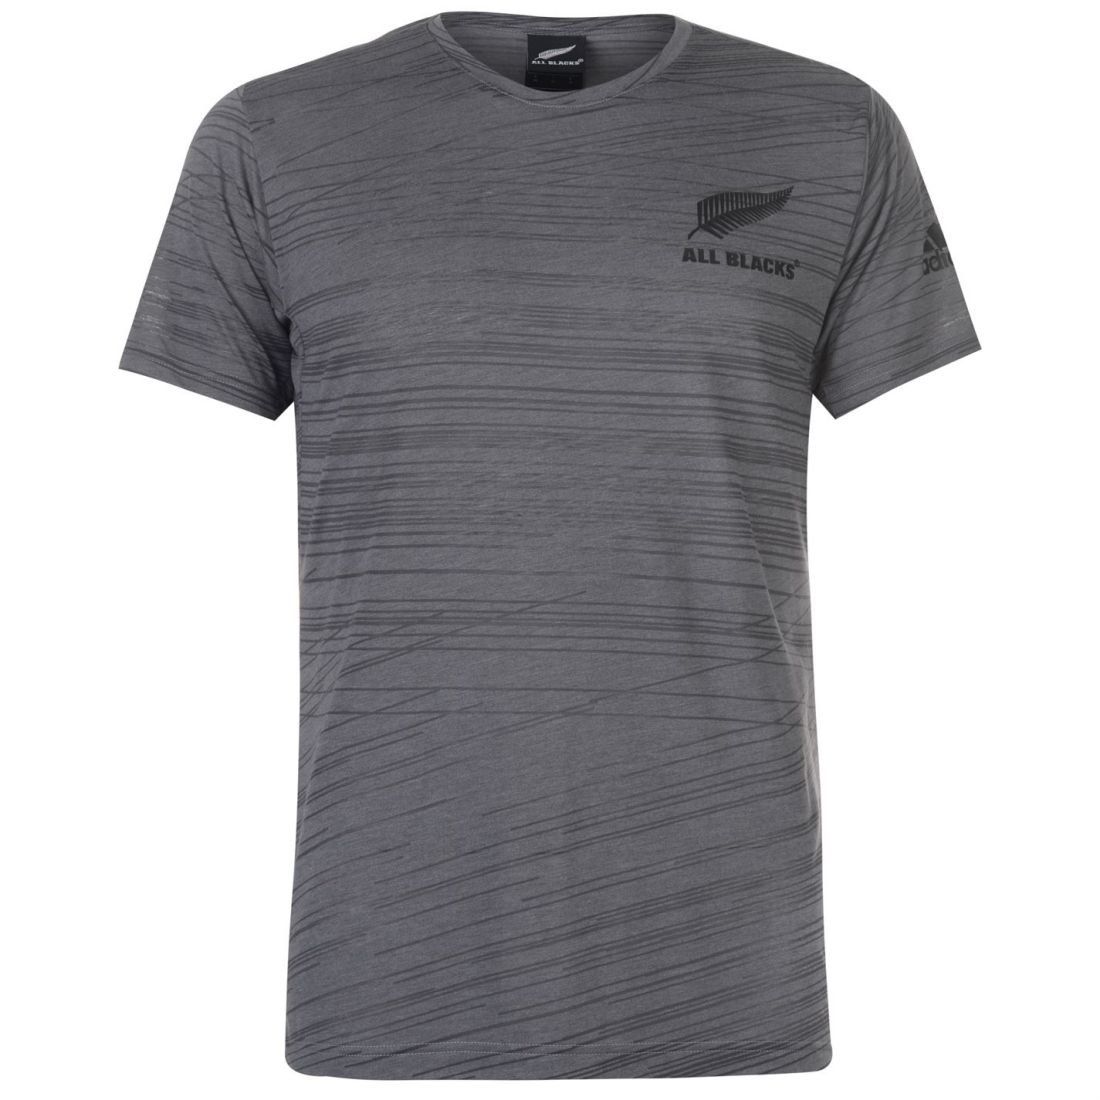 bb00720b45826 adidas Mens New Zealand All Blacks Poly T Shirt Training Tee Top Short  Sleeve